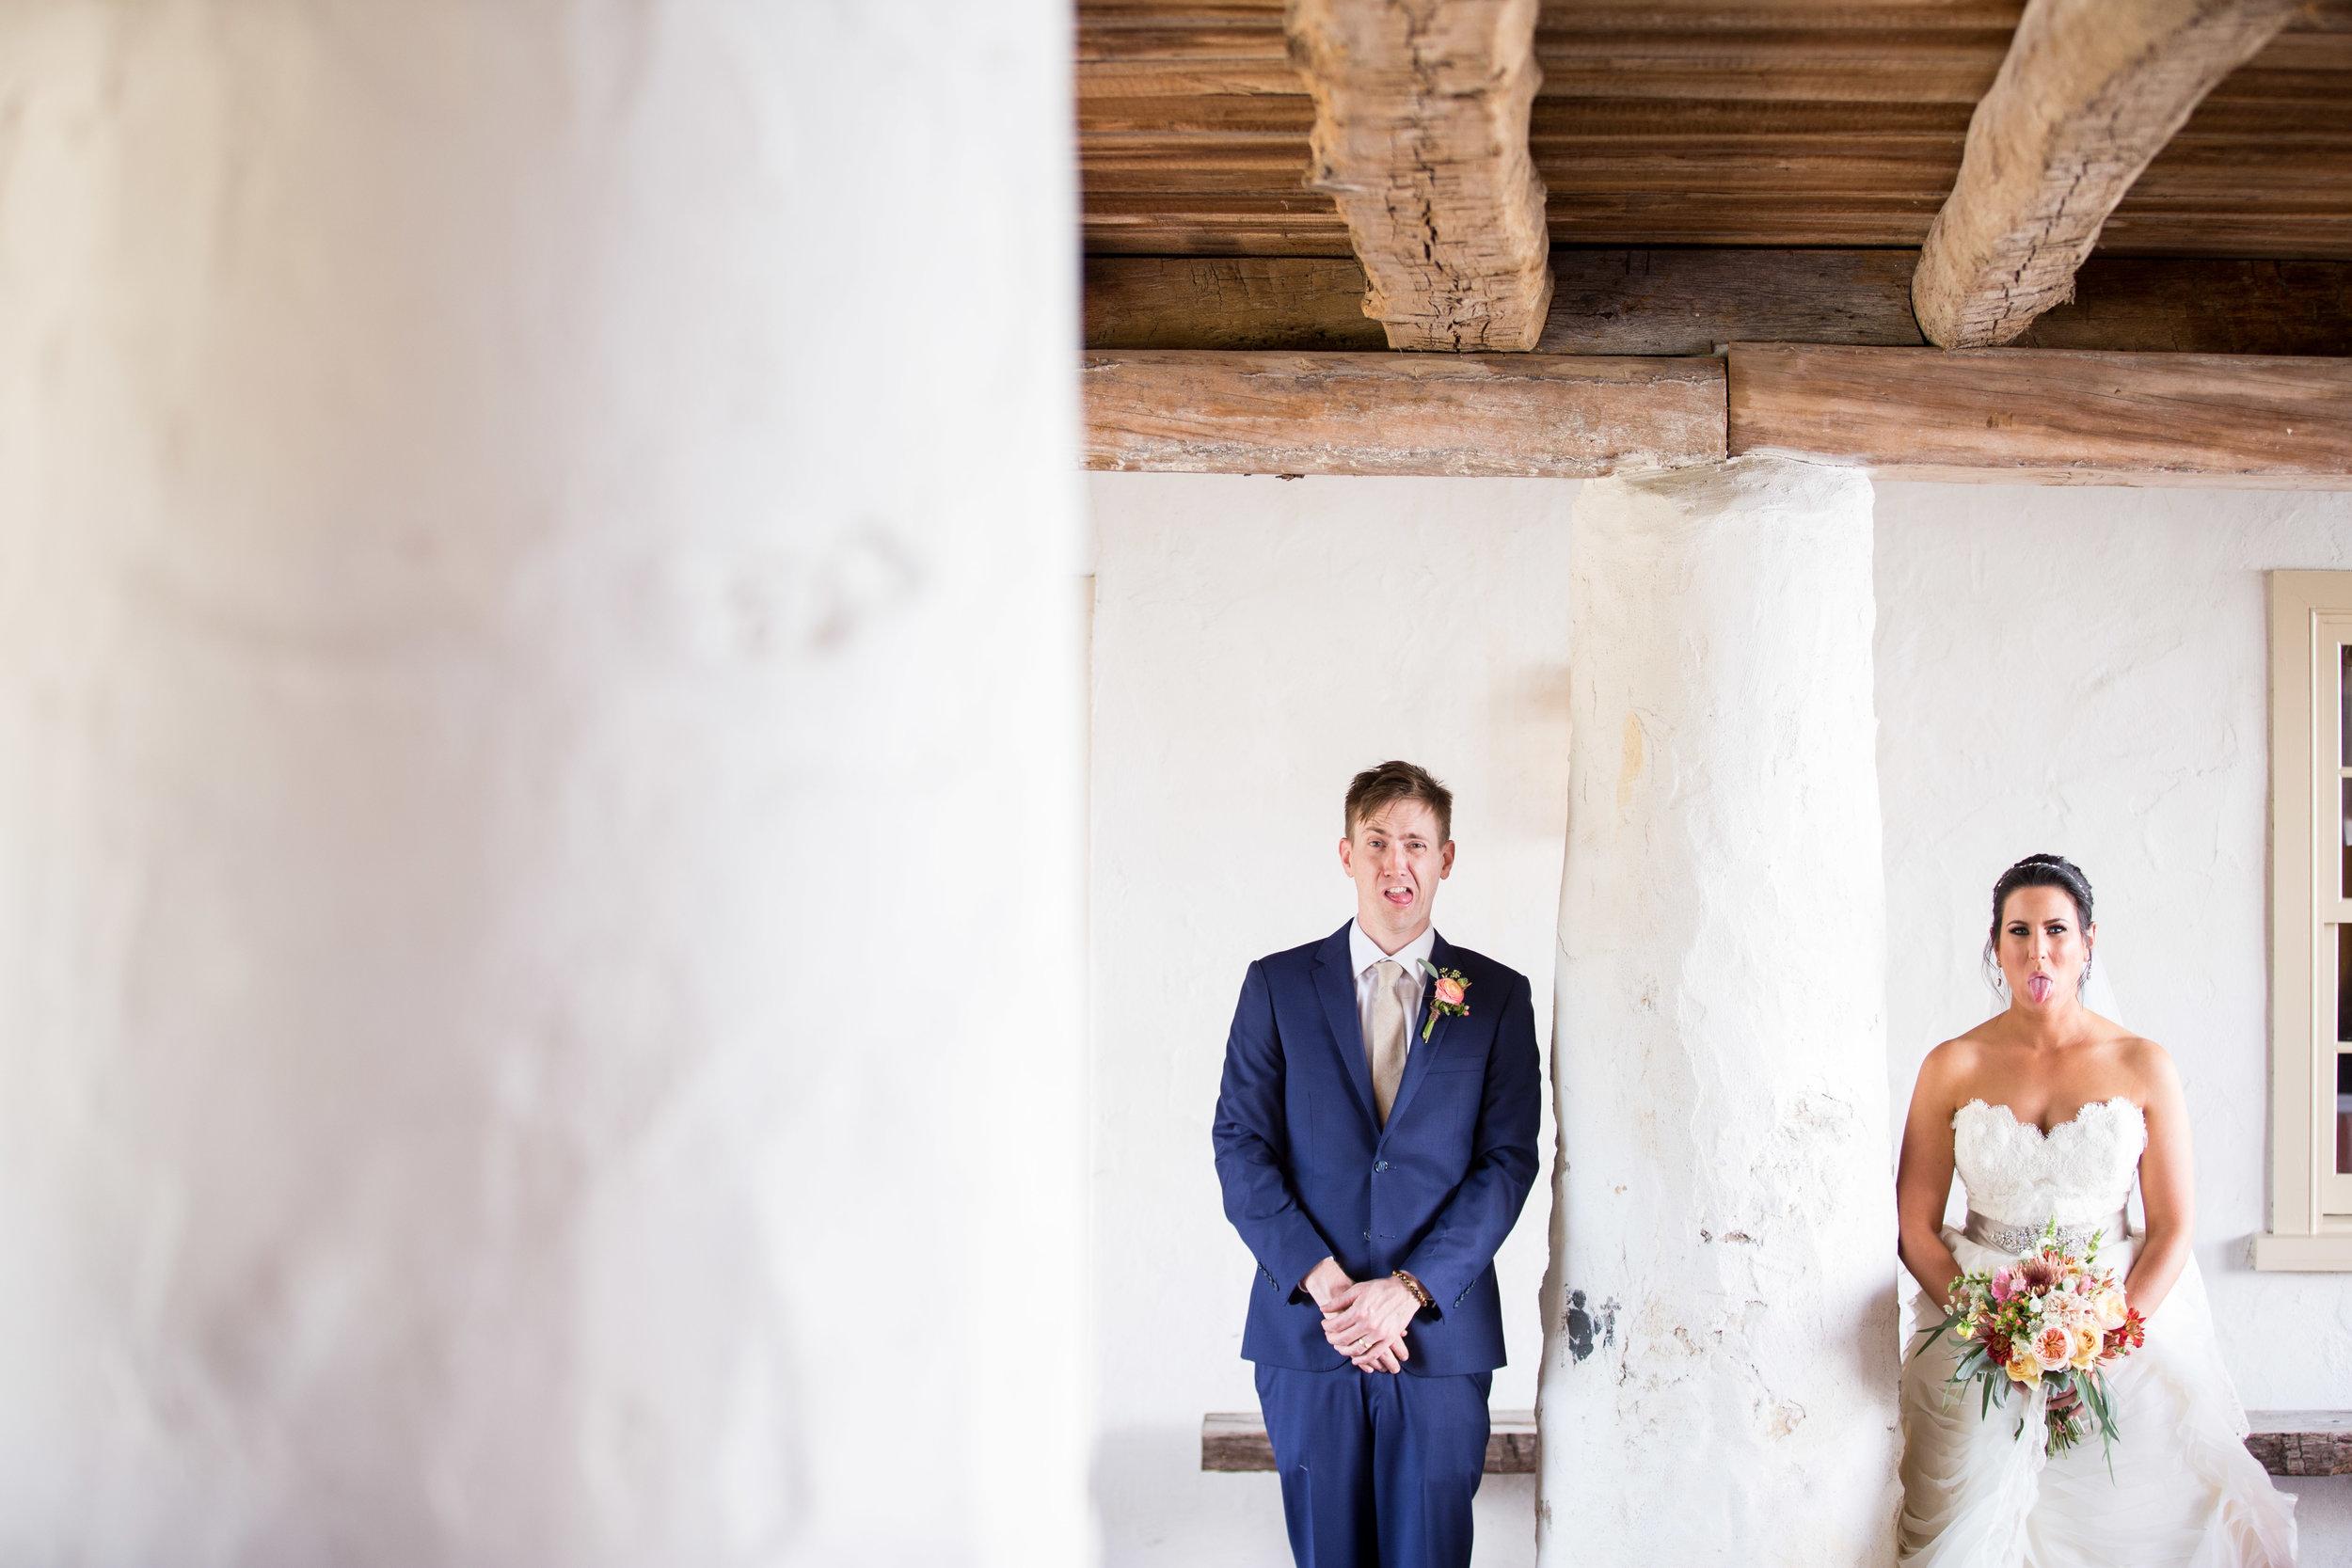 Philadelphia-Wedding-Planner-Heart-And-Dash-NicoleConnor-DrewNoelPhotography-1374.jpg